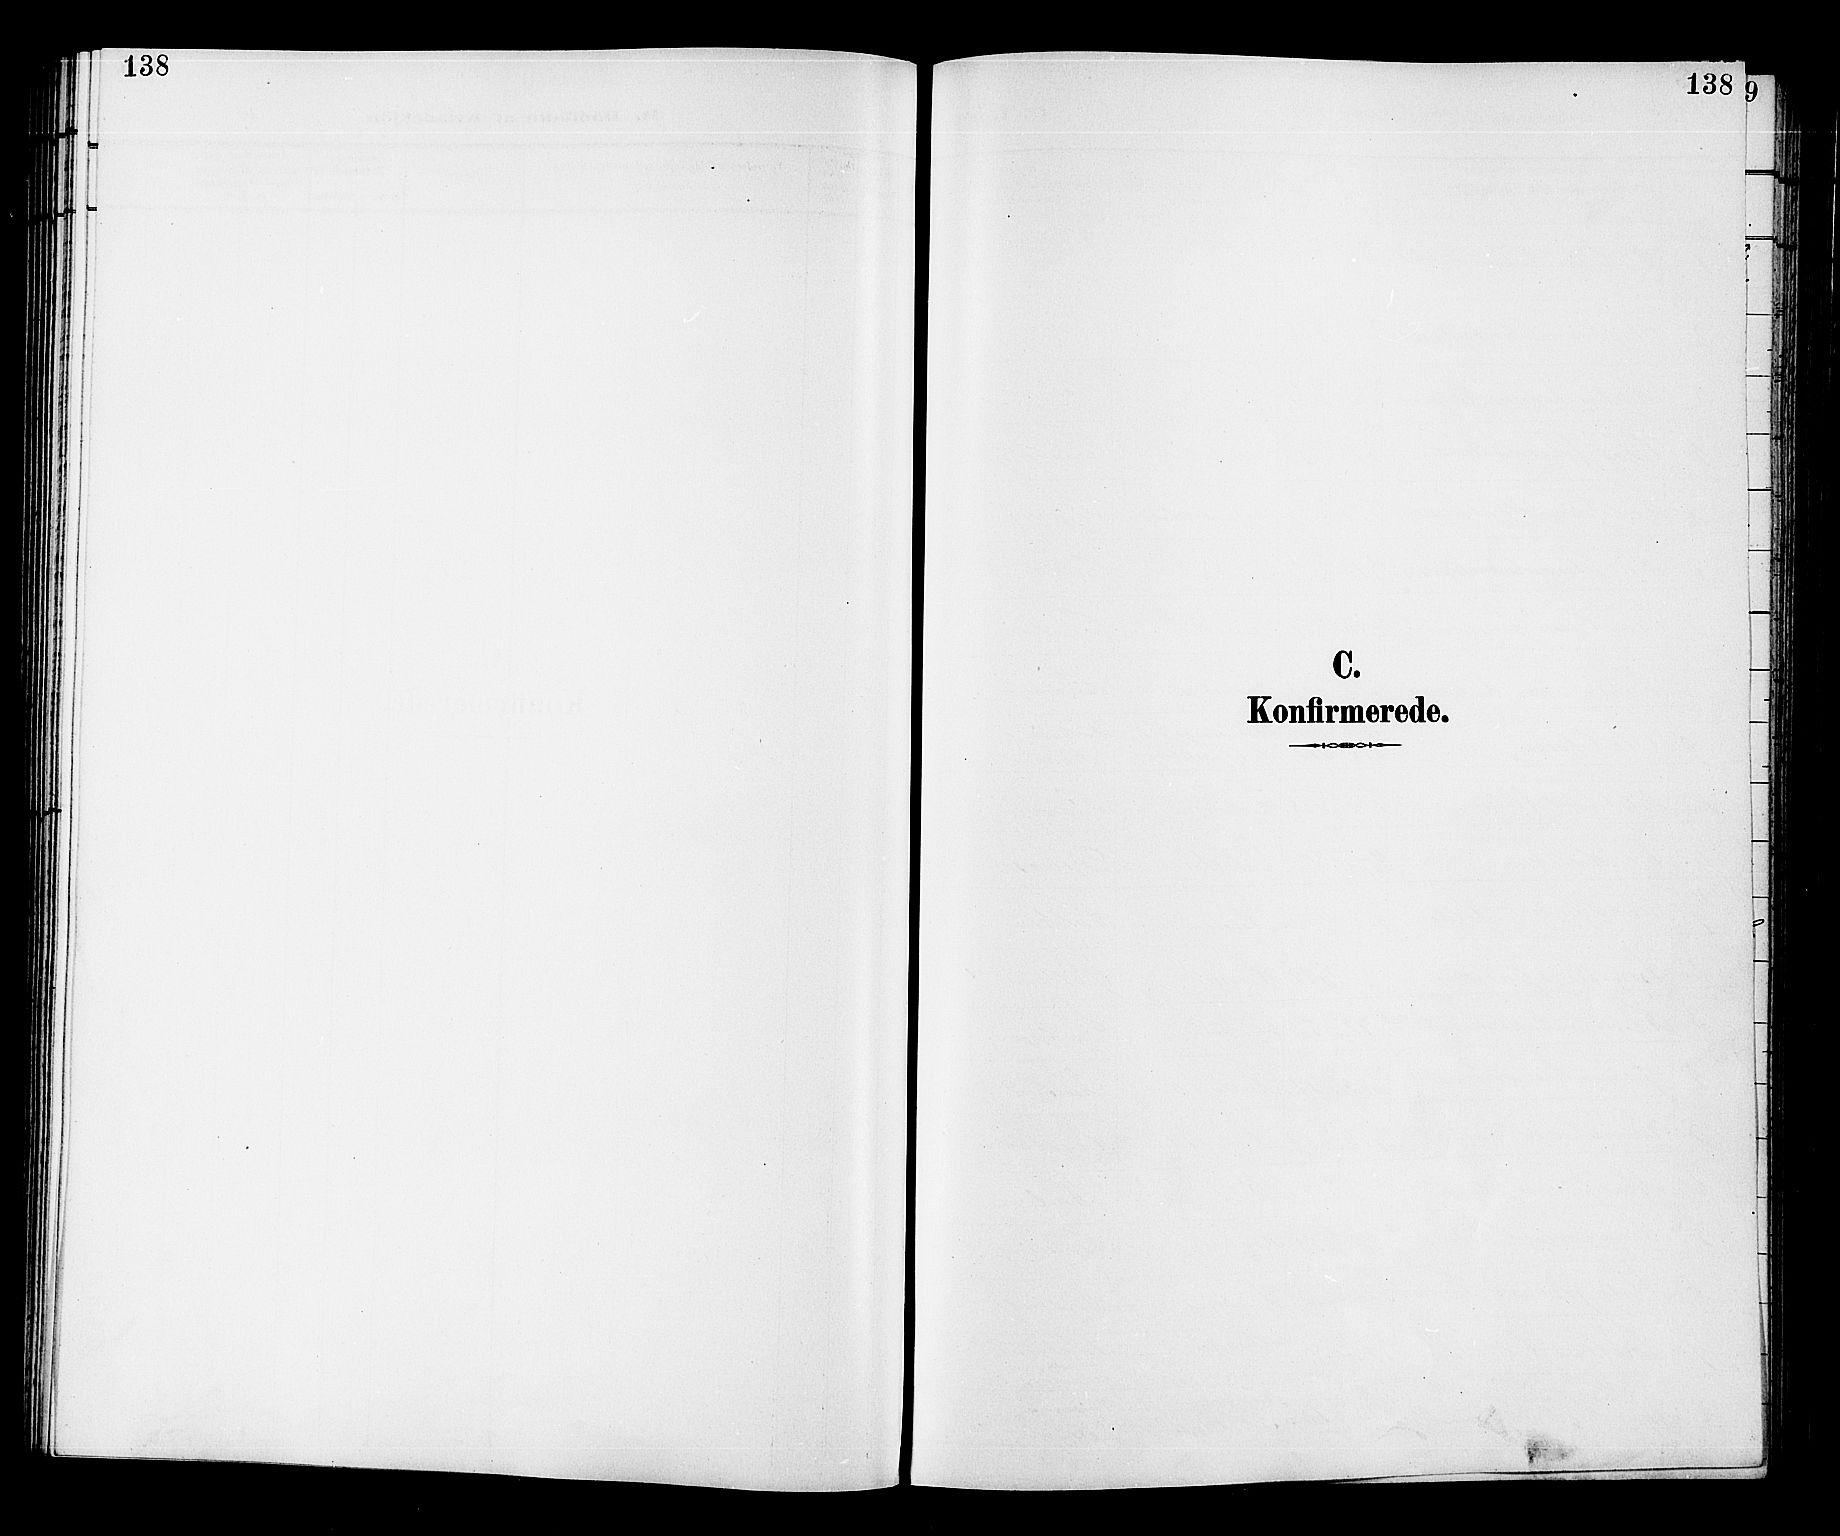 SAKO, Fiskum kirkebøker, G/Ga/L0005: Parish register (copy) no. 5, 1887-1912, p. 138